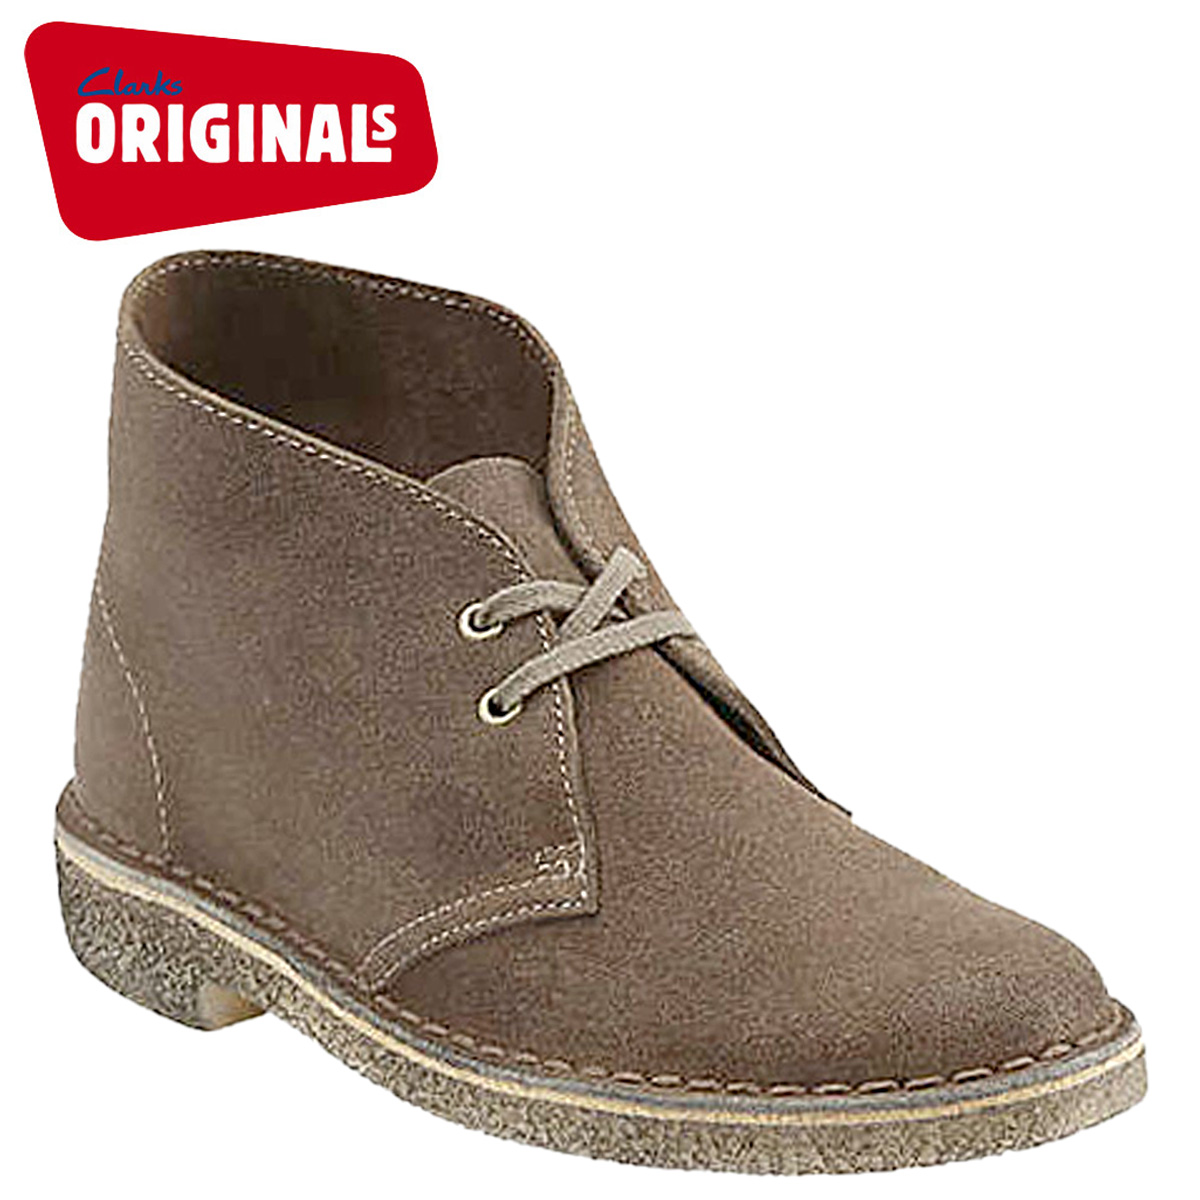 3030d9b4a2 Clarks ORIGINALS kulaki originals desert boots DESERT BOOT 78354 men